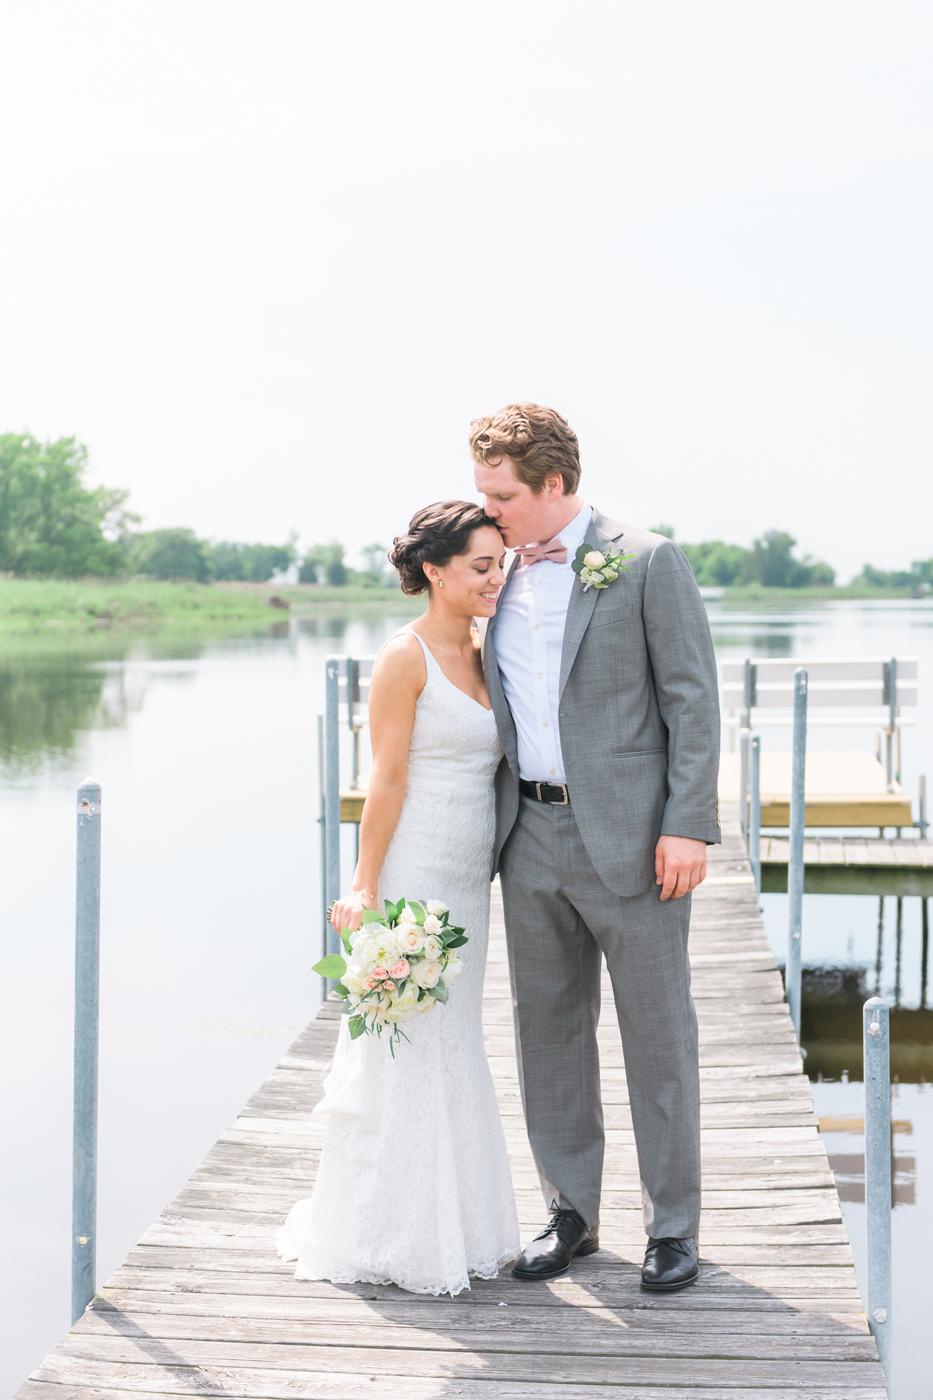 033-0074-jr_huntingfield-wedding-5616